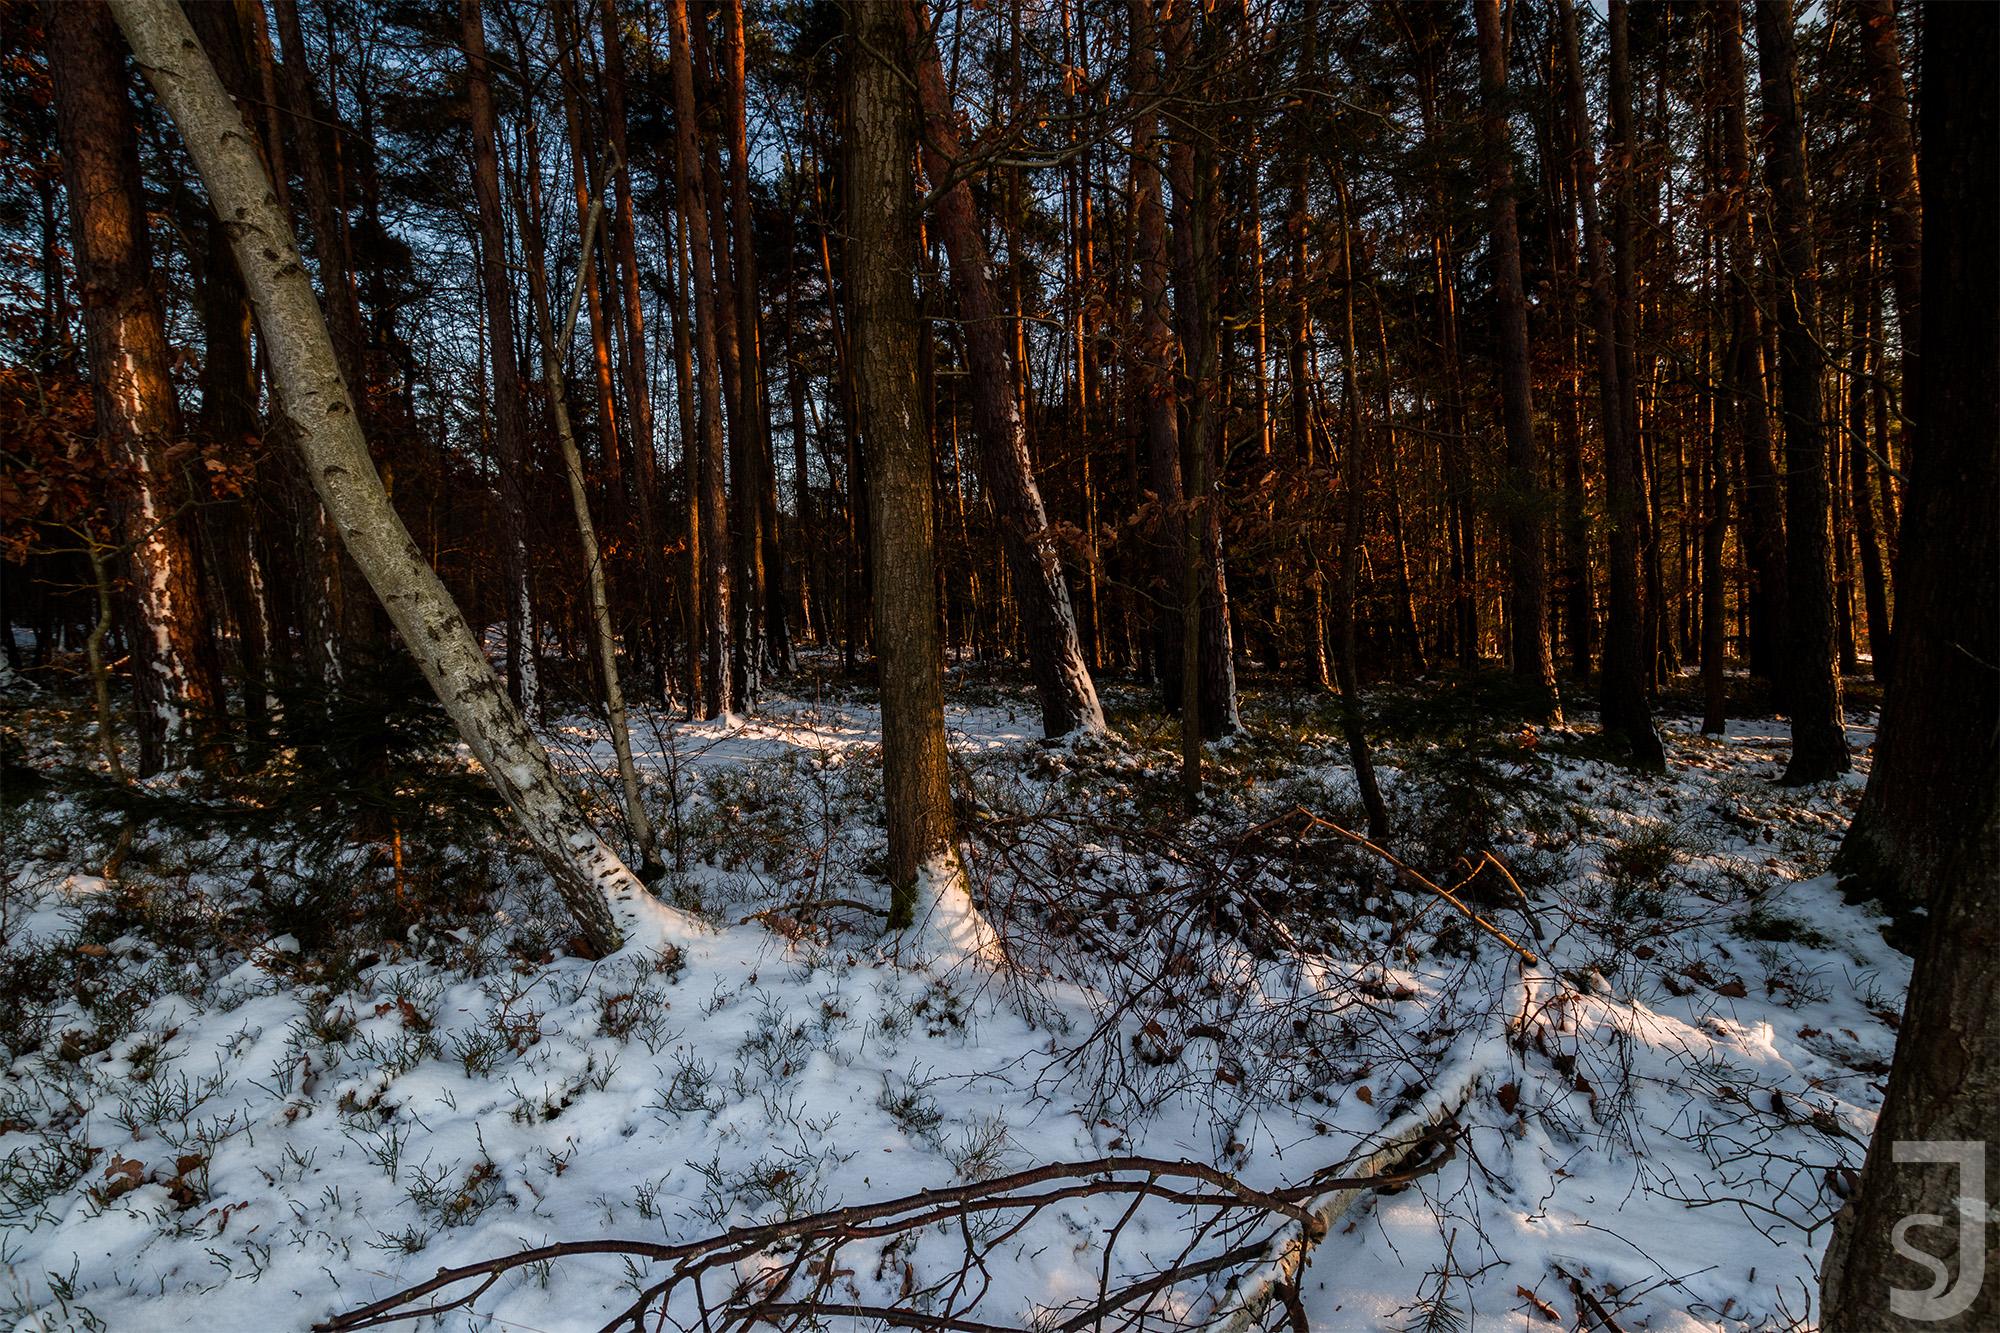 Winterwald, Unterfranken